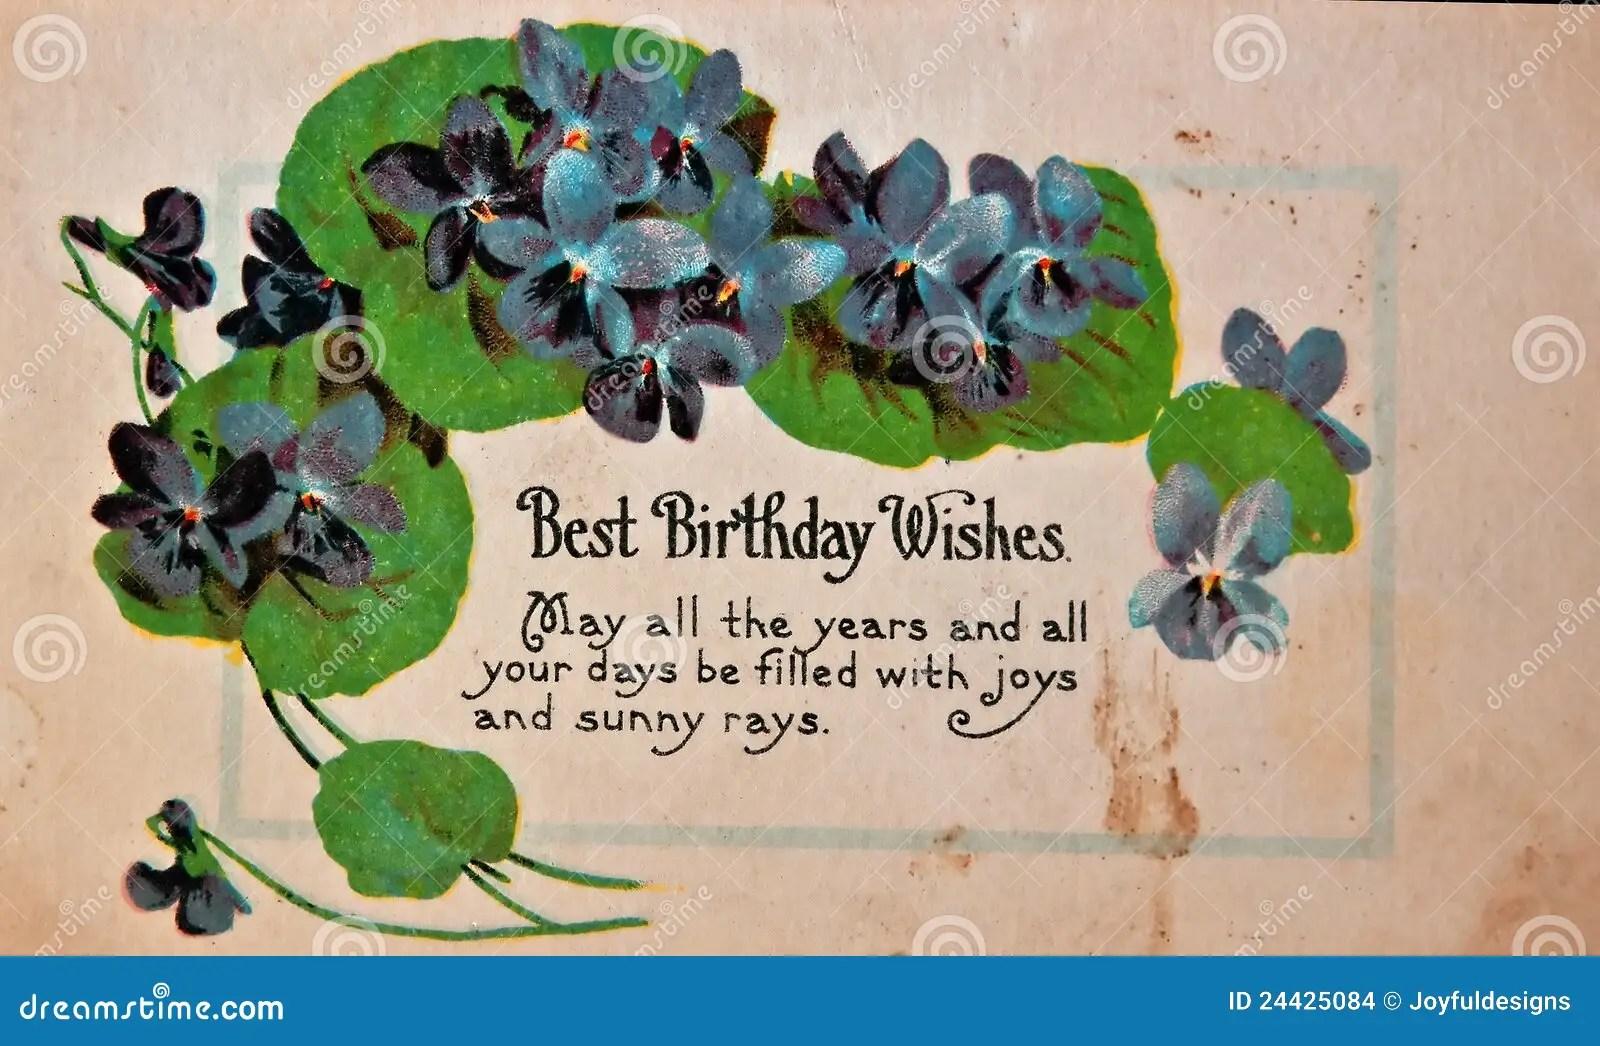 USA CIRCA 1900 Vintage Birthday Card Stock Photo Image